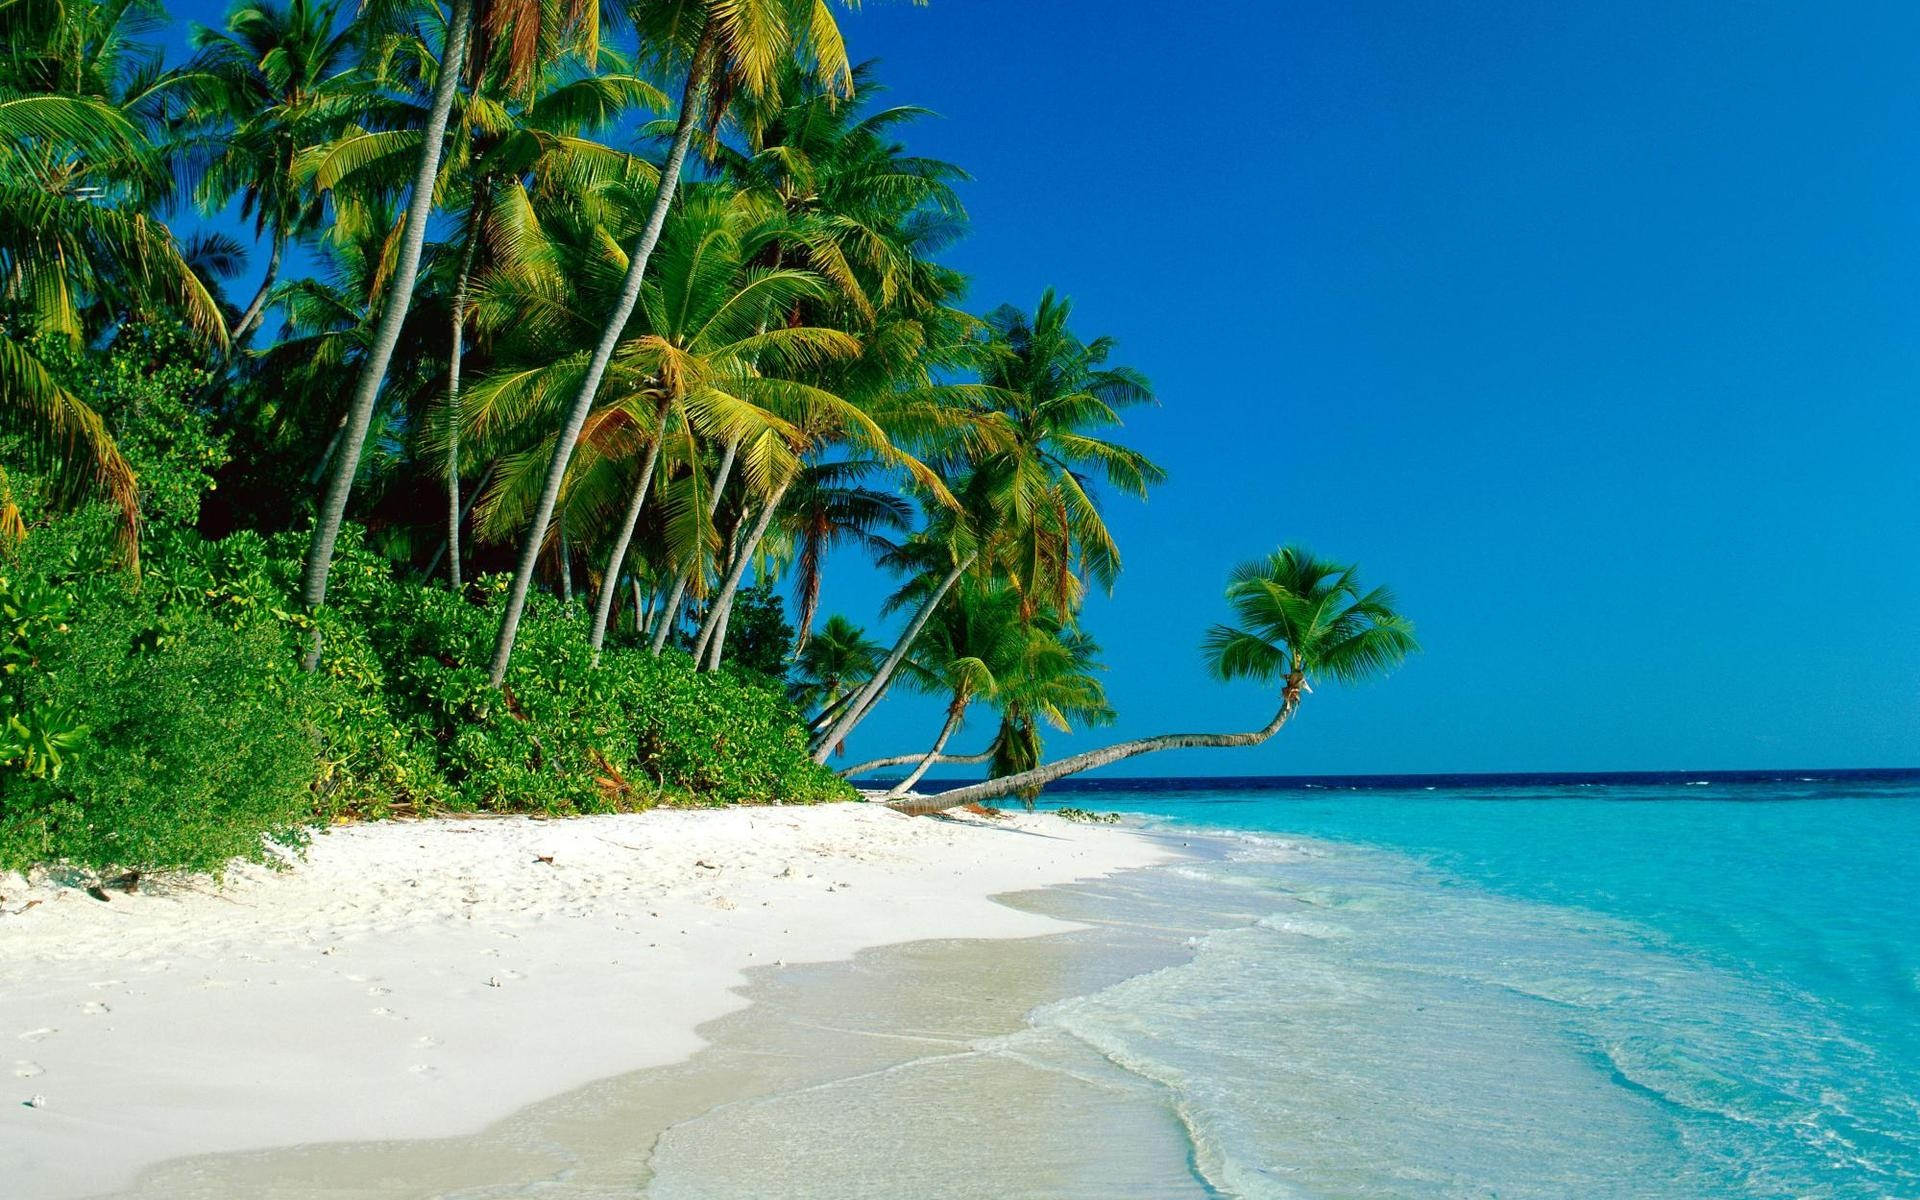 Tropical Beach Cook Islands Wallpaper Xpx 1920x1200px